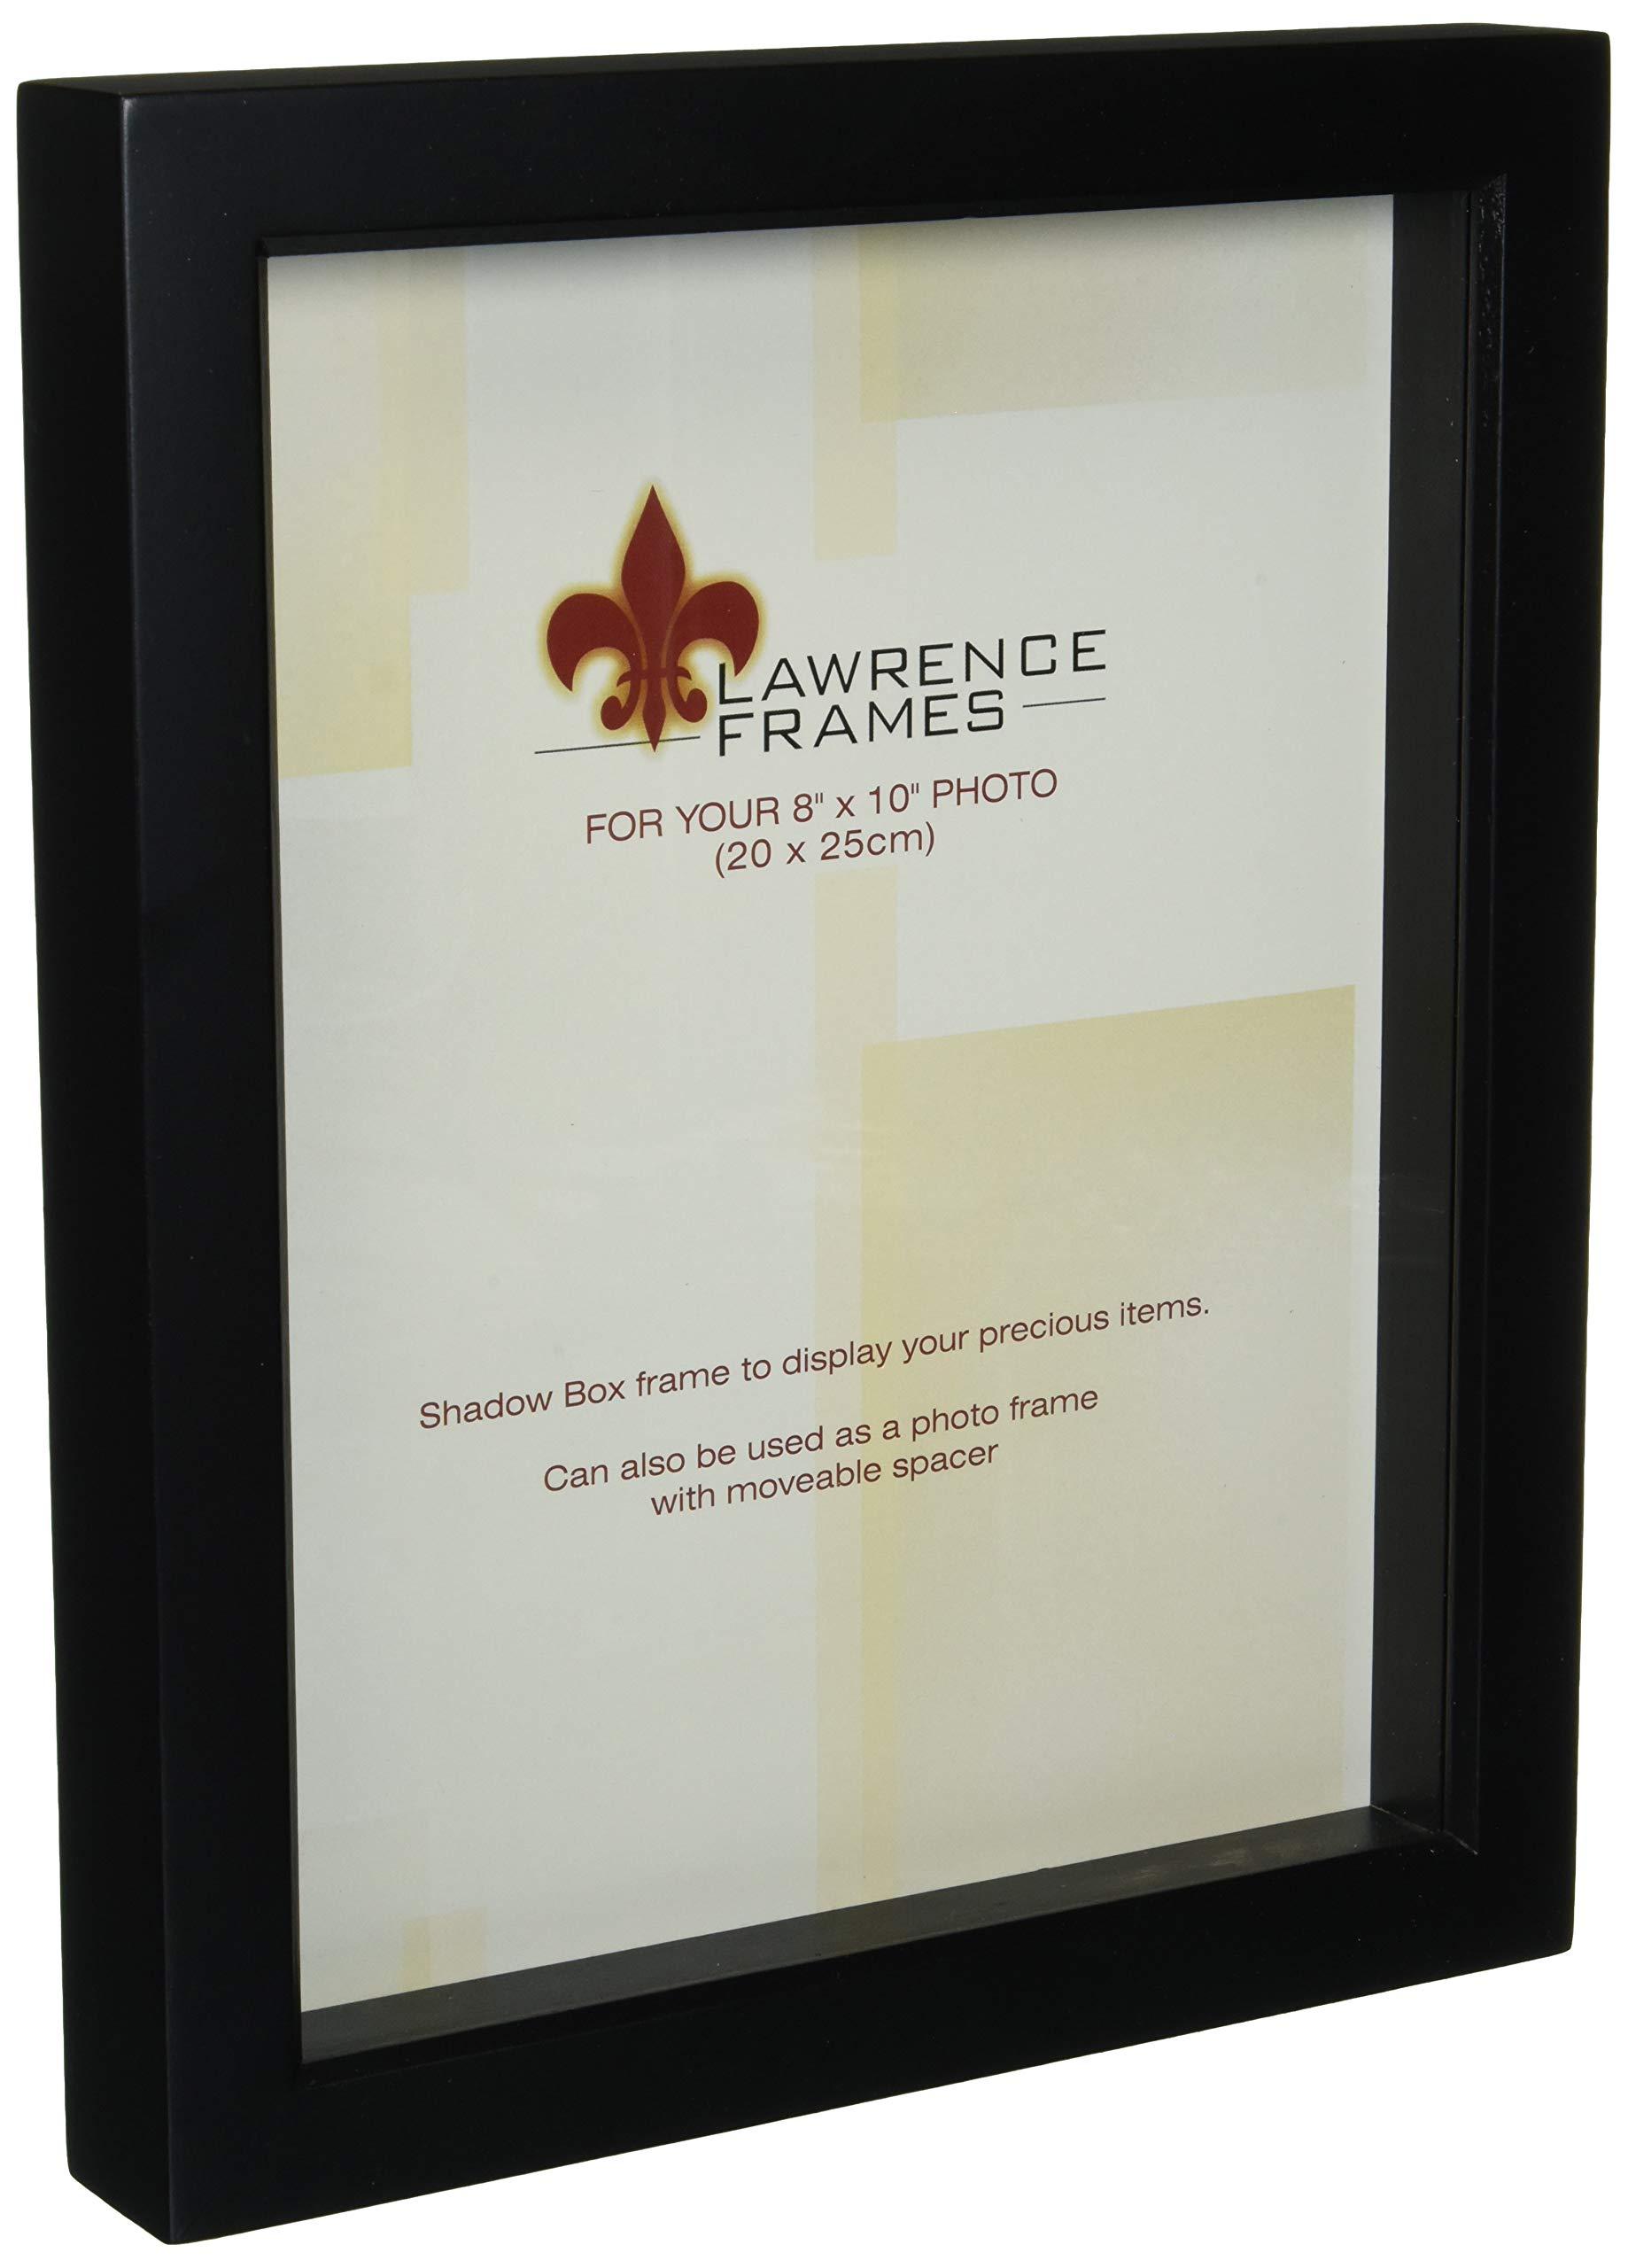 Lawrence Frames 795080 Black Wood Treasure Box Shadow Box Picture Frame, 8 by 10-Inch by Lawrence Frames